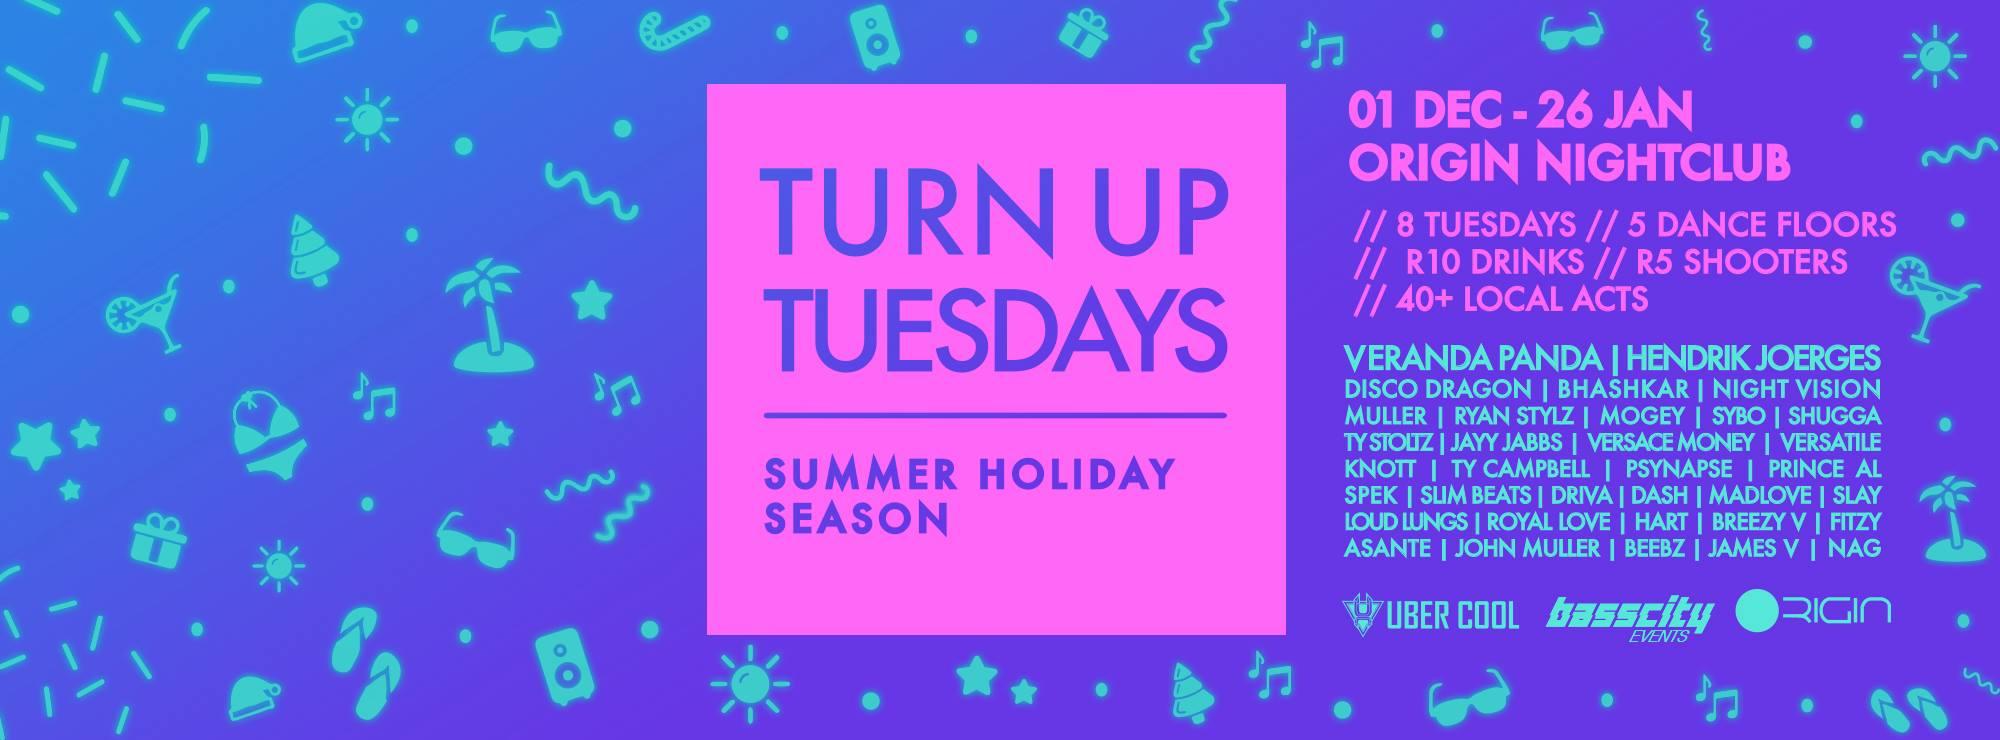 Origin Nightclub, South Africa | Turn up Tuesdays